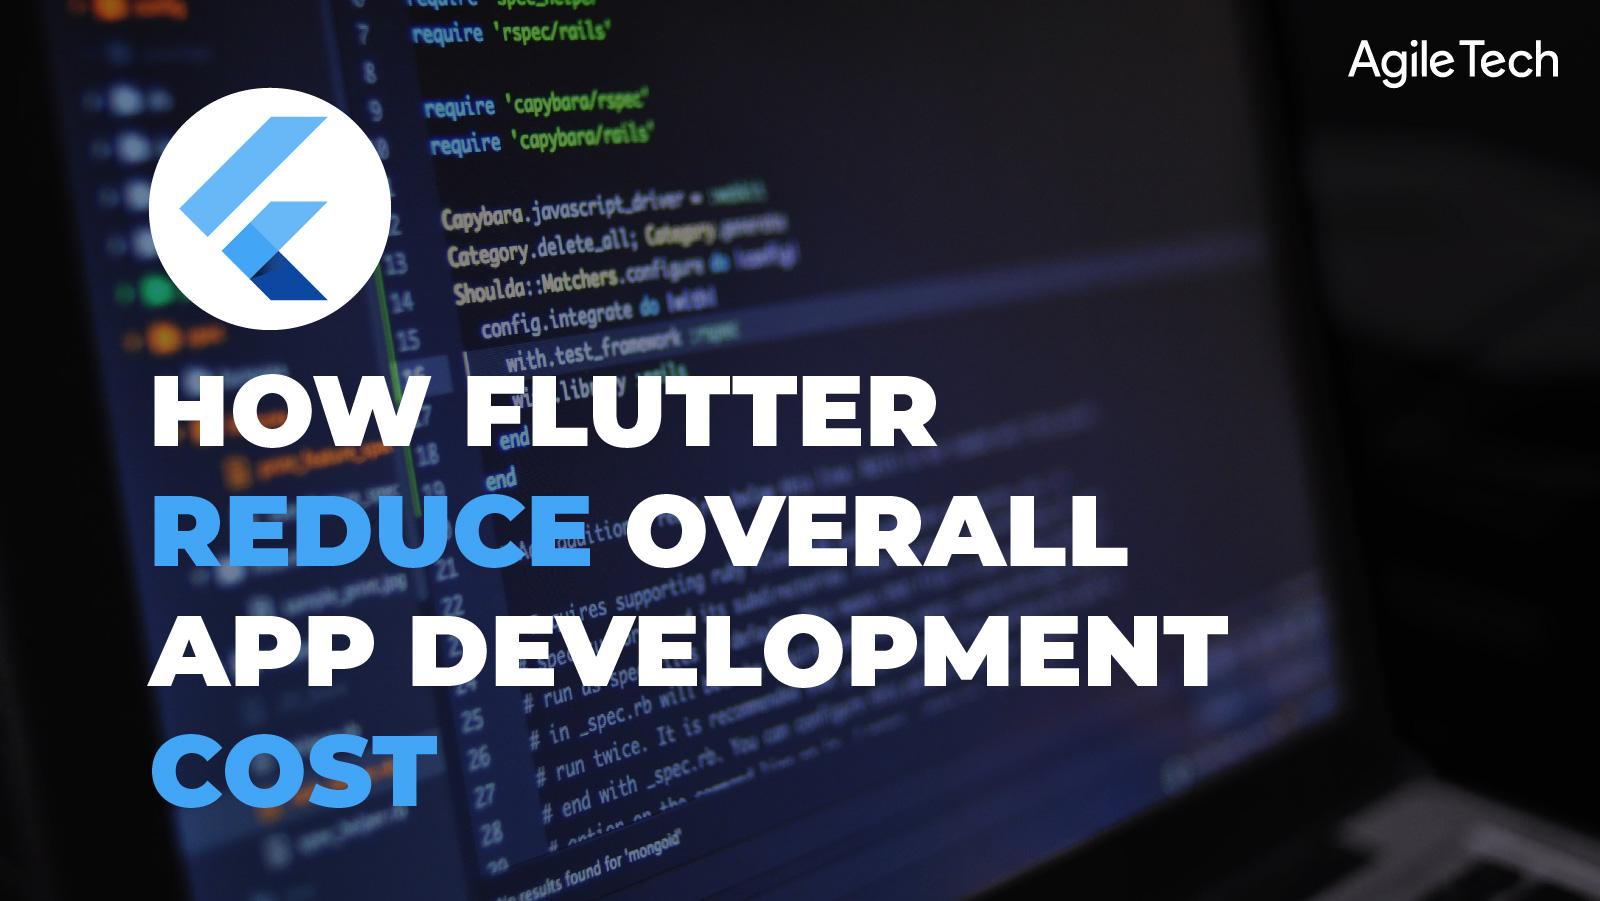 flutter app development, cross platform mobile app development framework, flutter reduce overall app development cost, agiletech